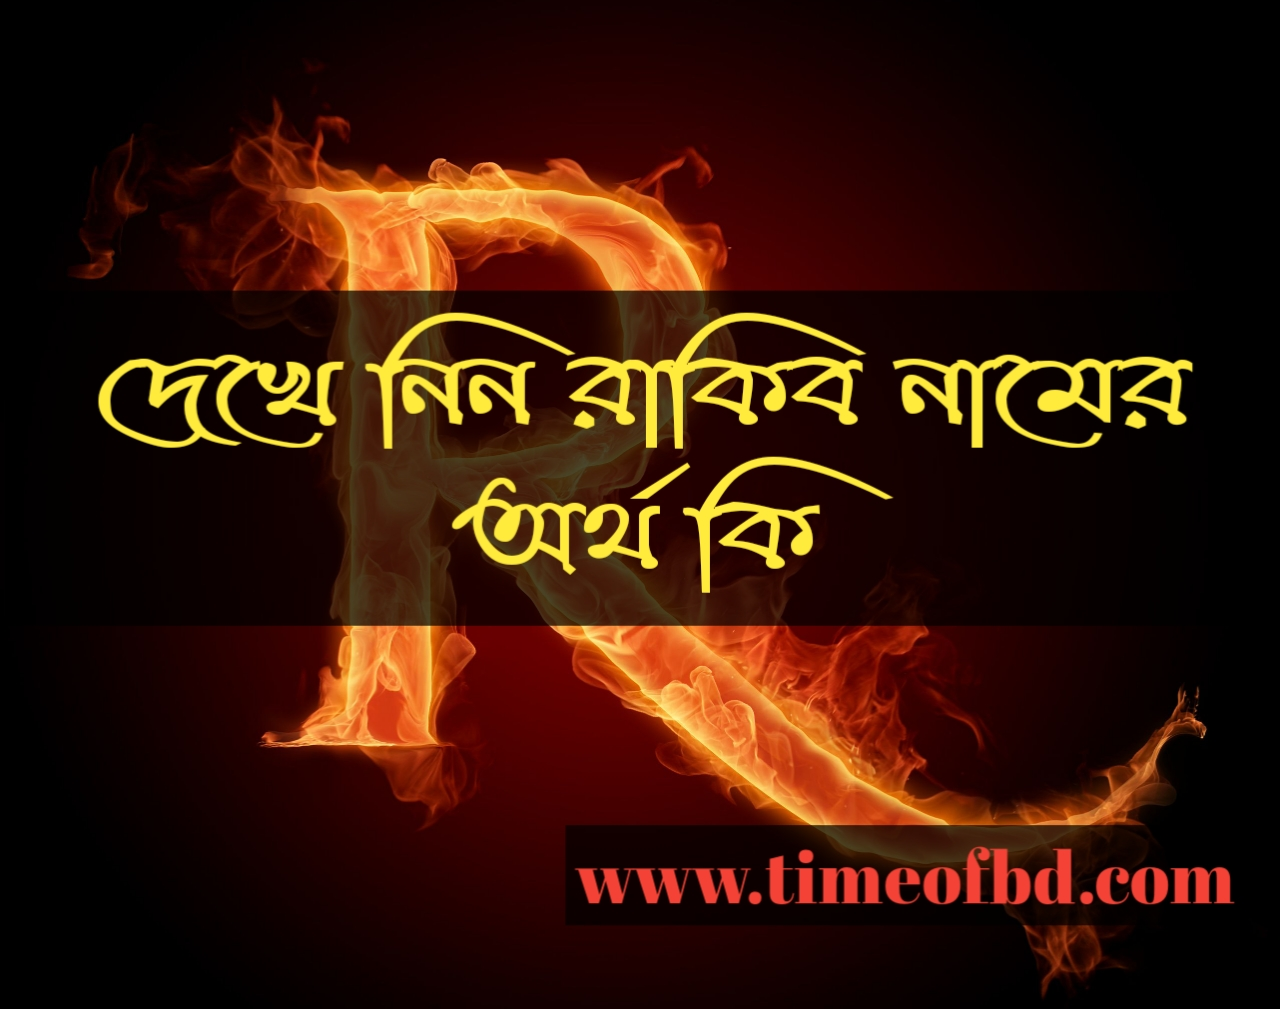 Rakib name meaning in Bengali, রাকিব নামের অর্থ কি, রাকিব নামের বাংলা অর্থ কি, রাকিব নামের ইসলামিক অর্থ কি,